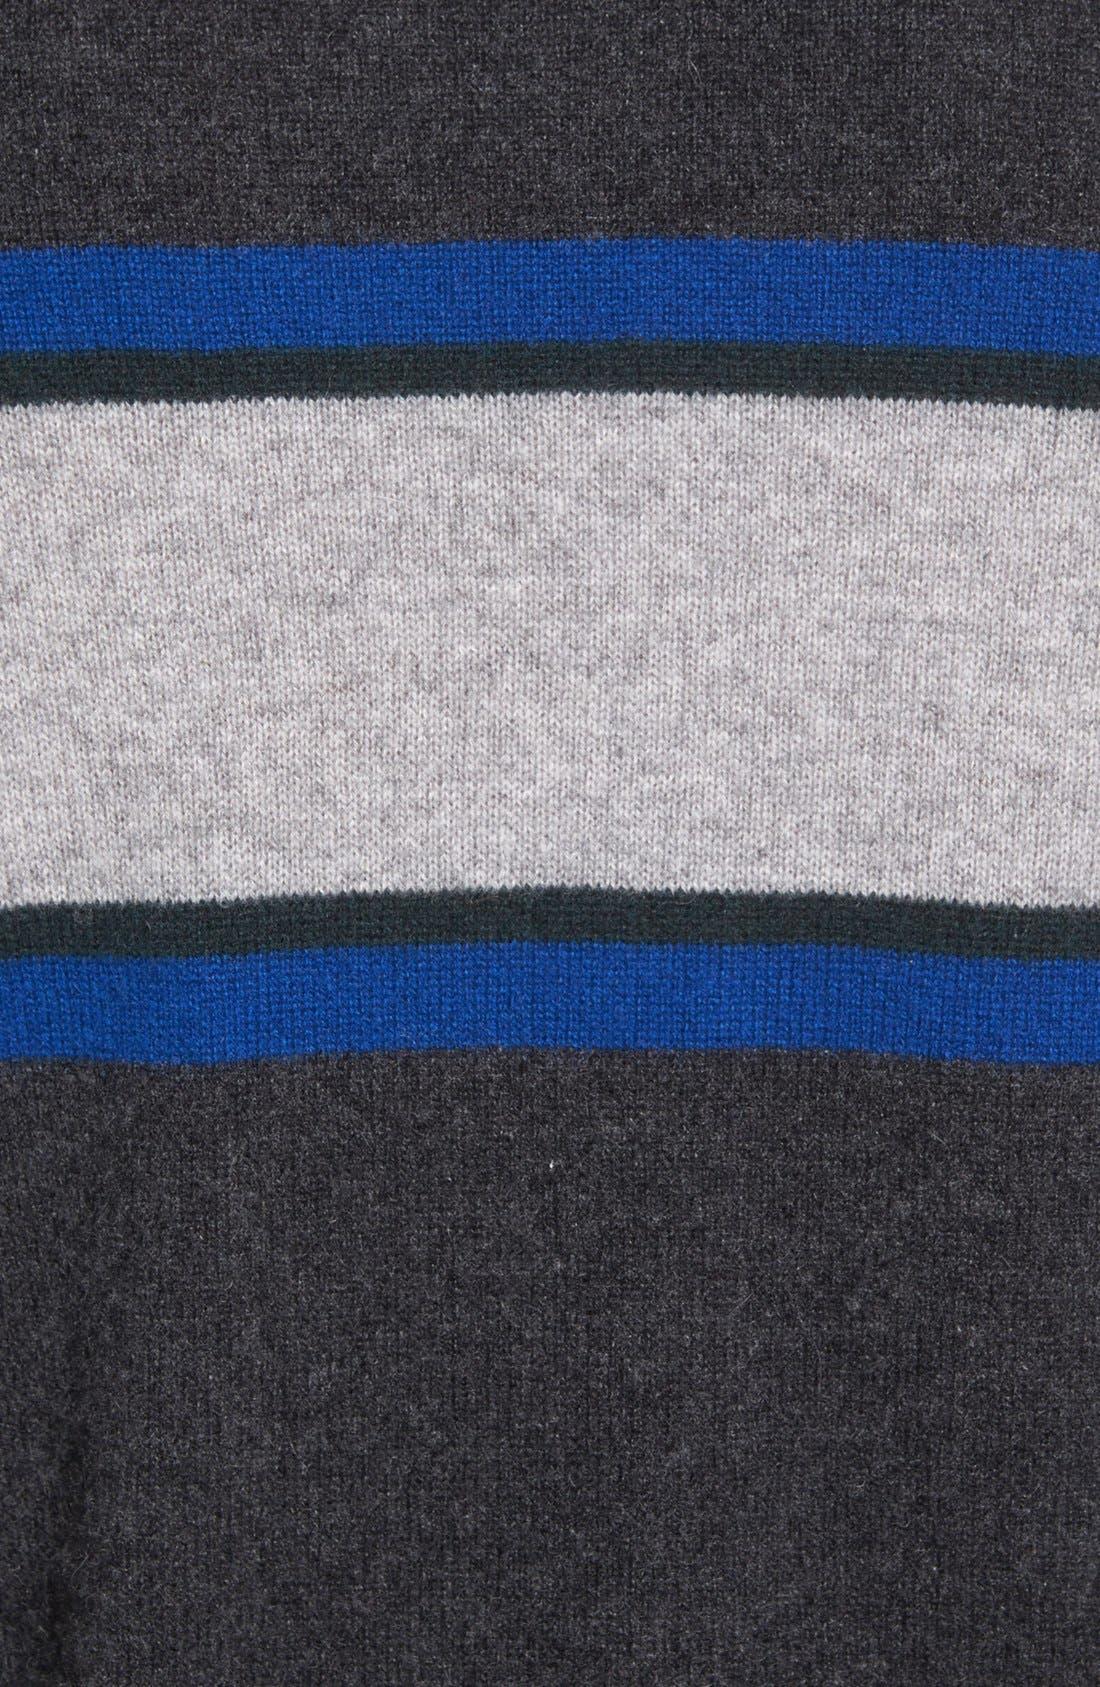 Alternate Image 3  - 1901 Cashmere V-Neck Sweater